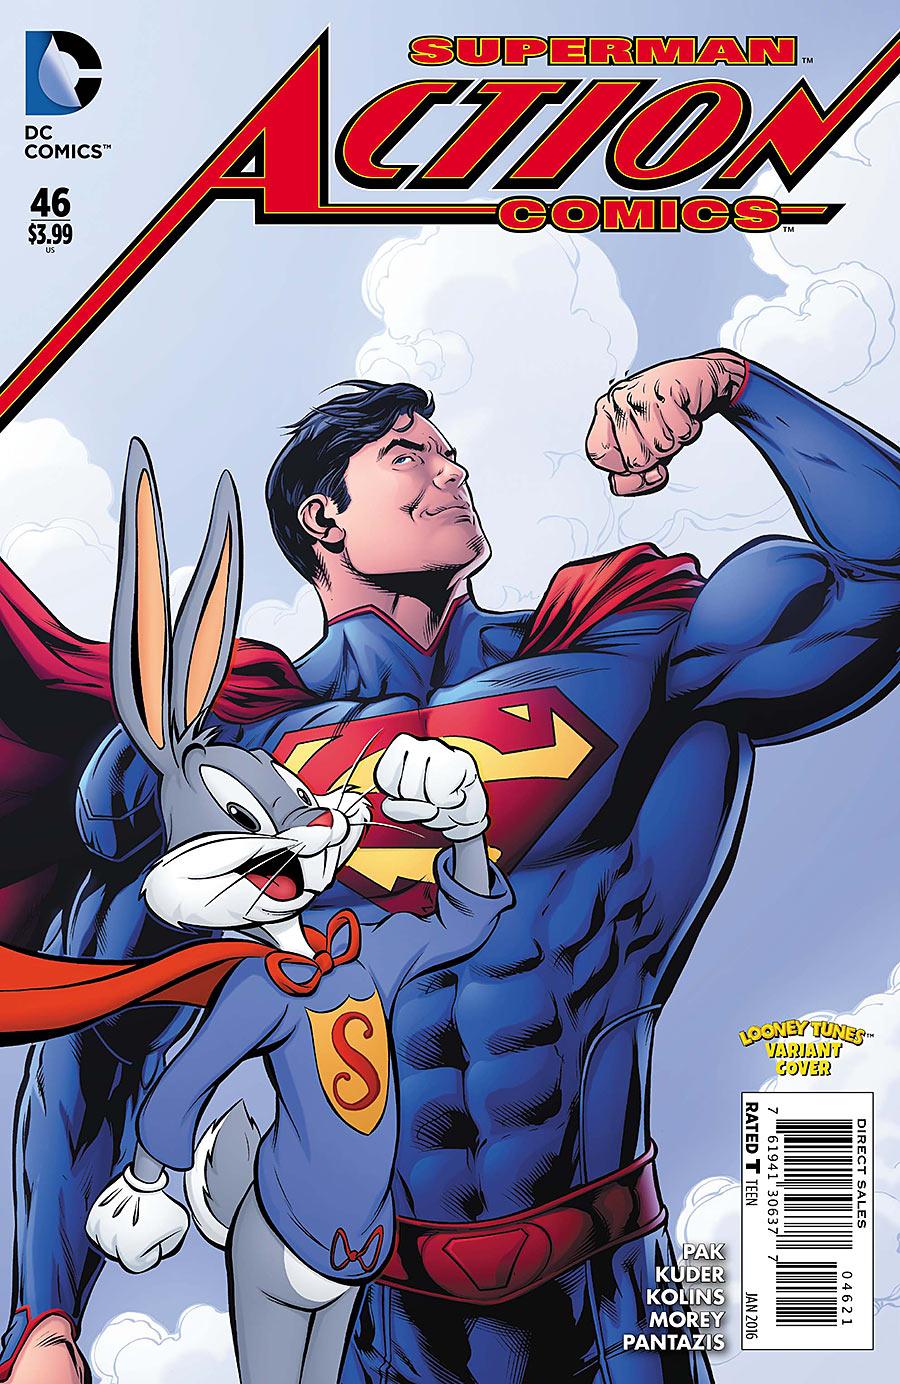 Action Comics Vol 2 46 Looney Tunes Variant.jpg